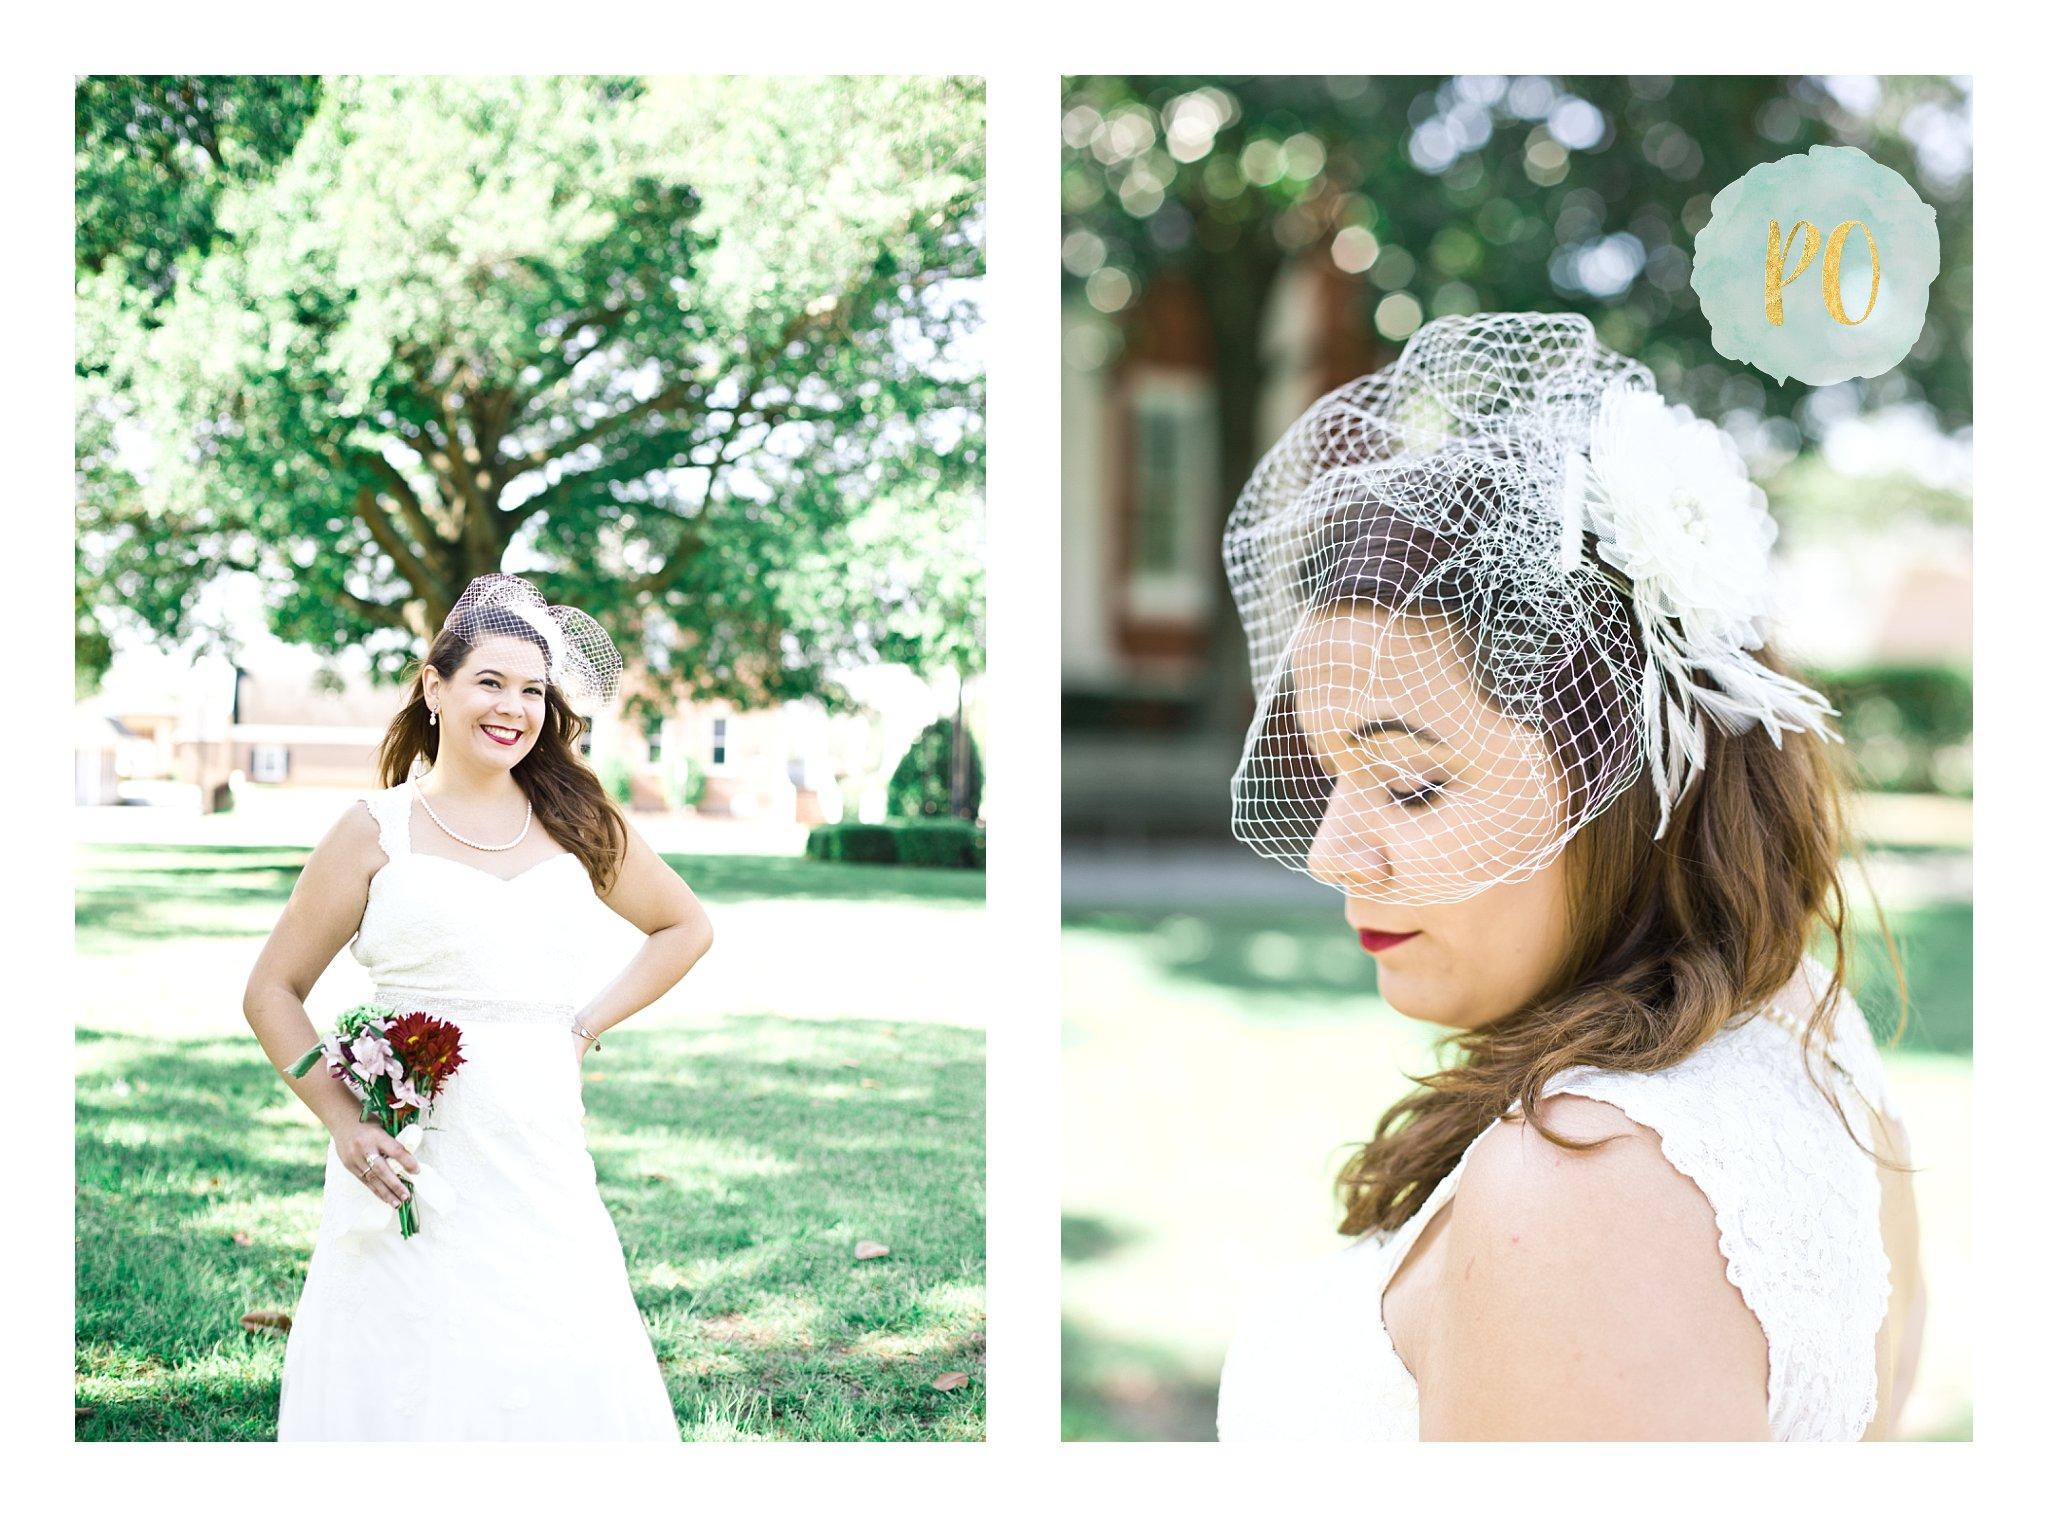 cypress-inn-lowcountry-bridal-session-conway-sc-photos_0145.jpg